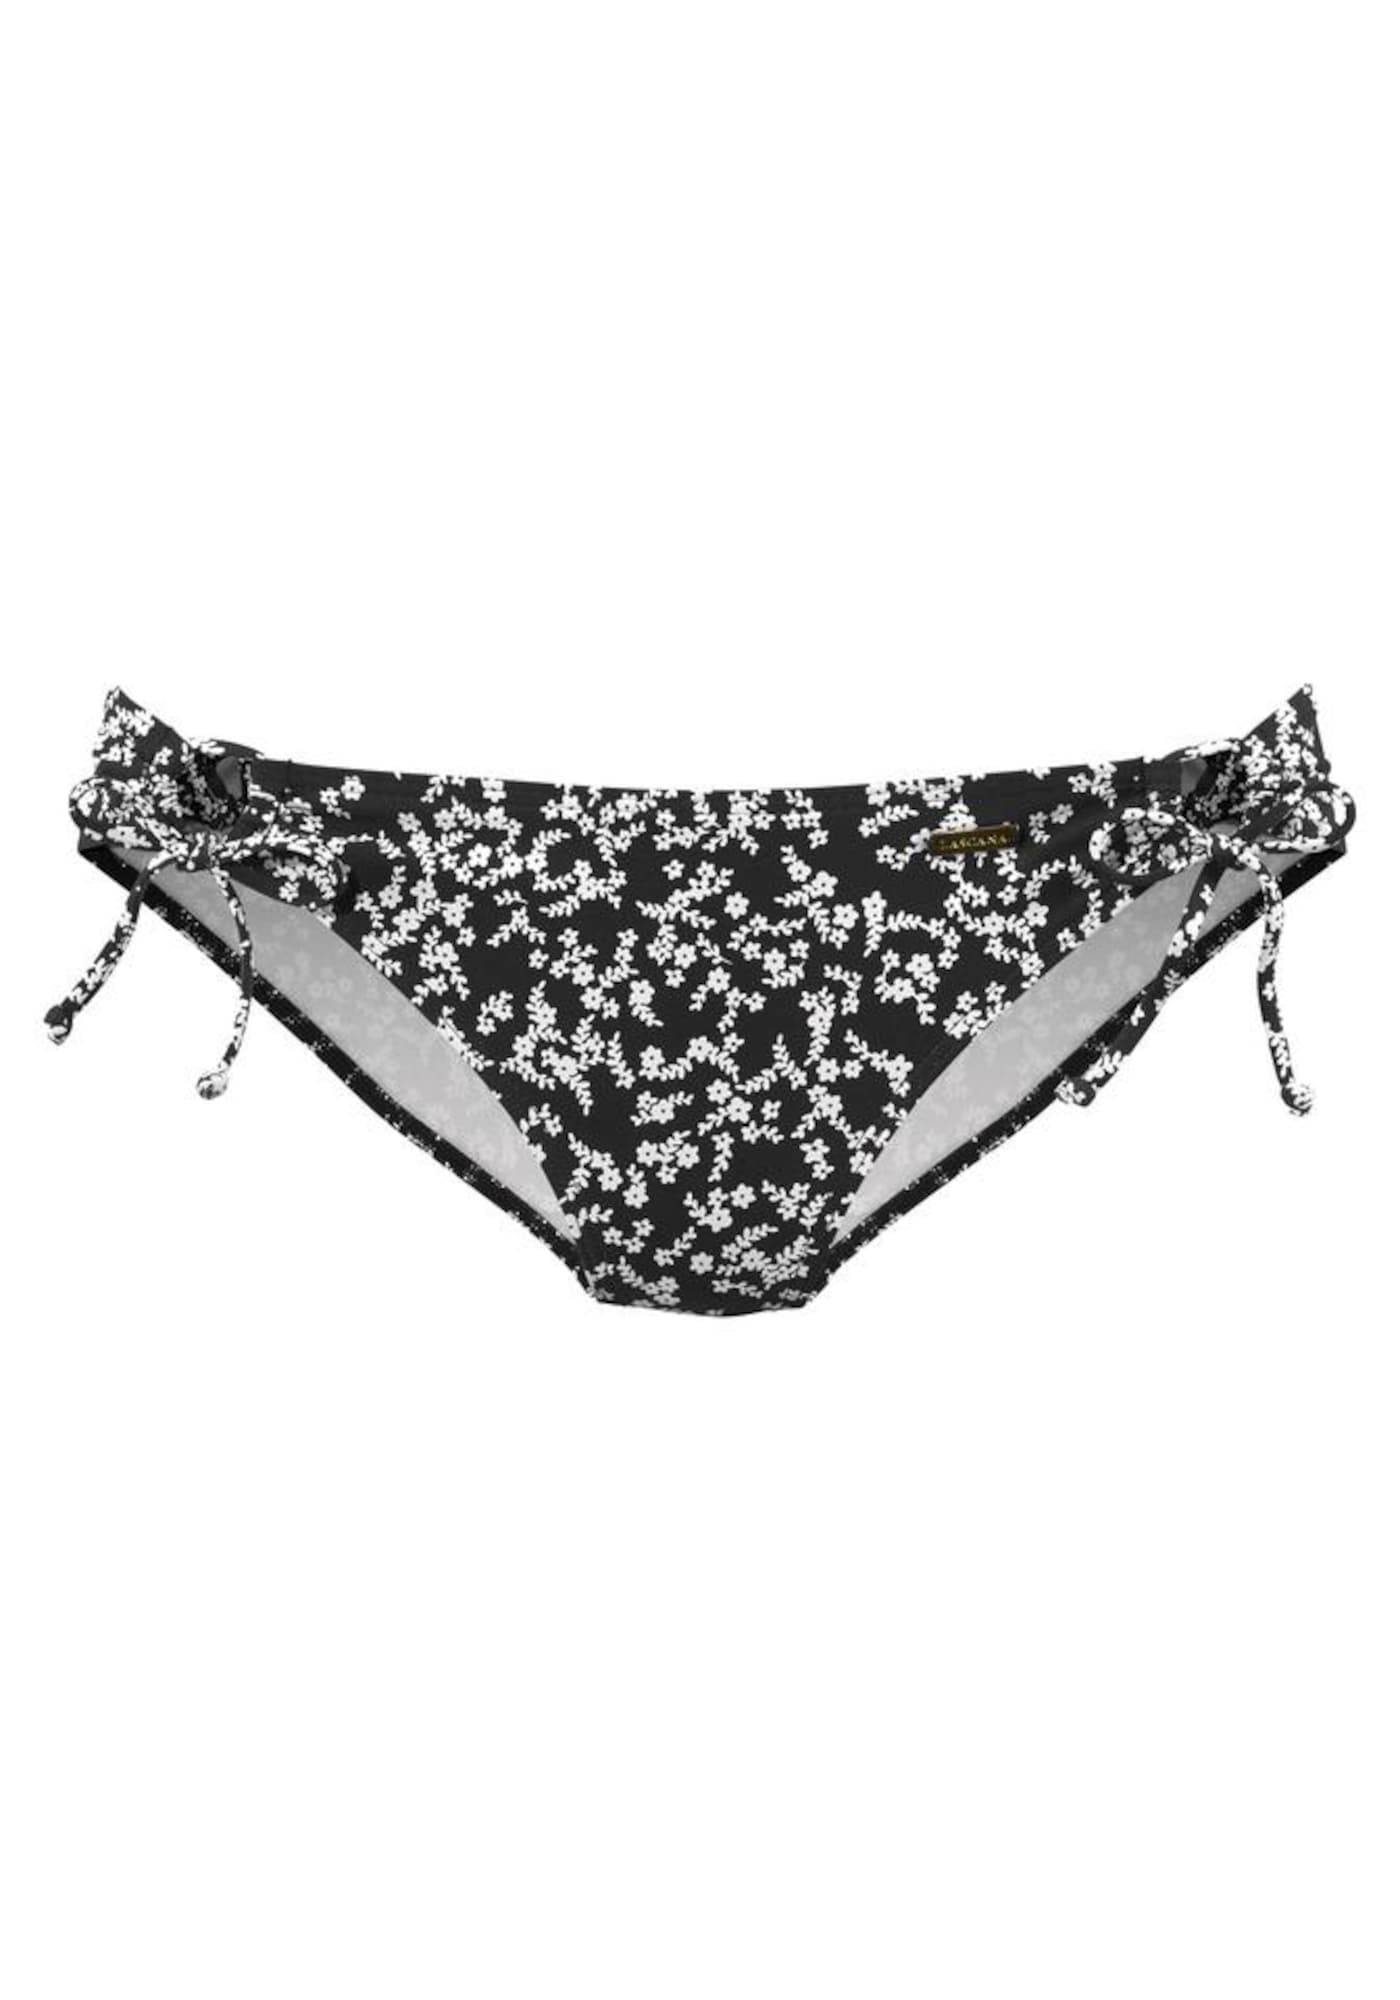 LASCANA Bas de bikini 'Meadow'  - Noir - Taille: 34 - female